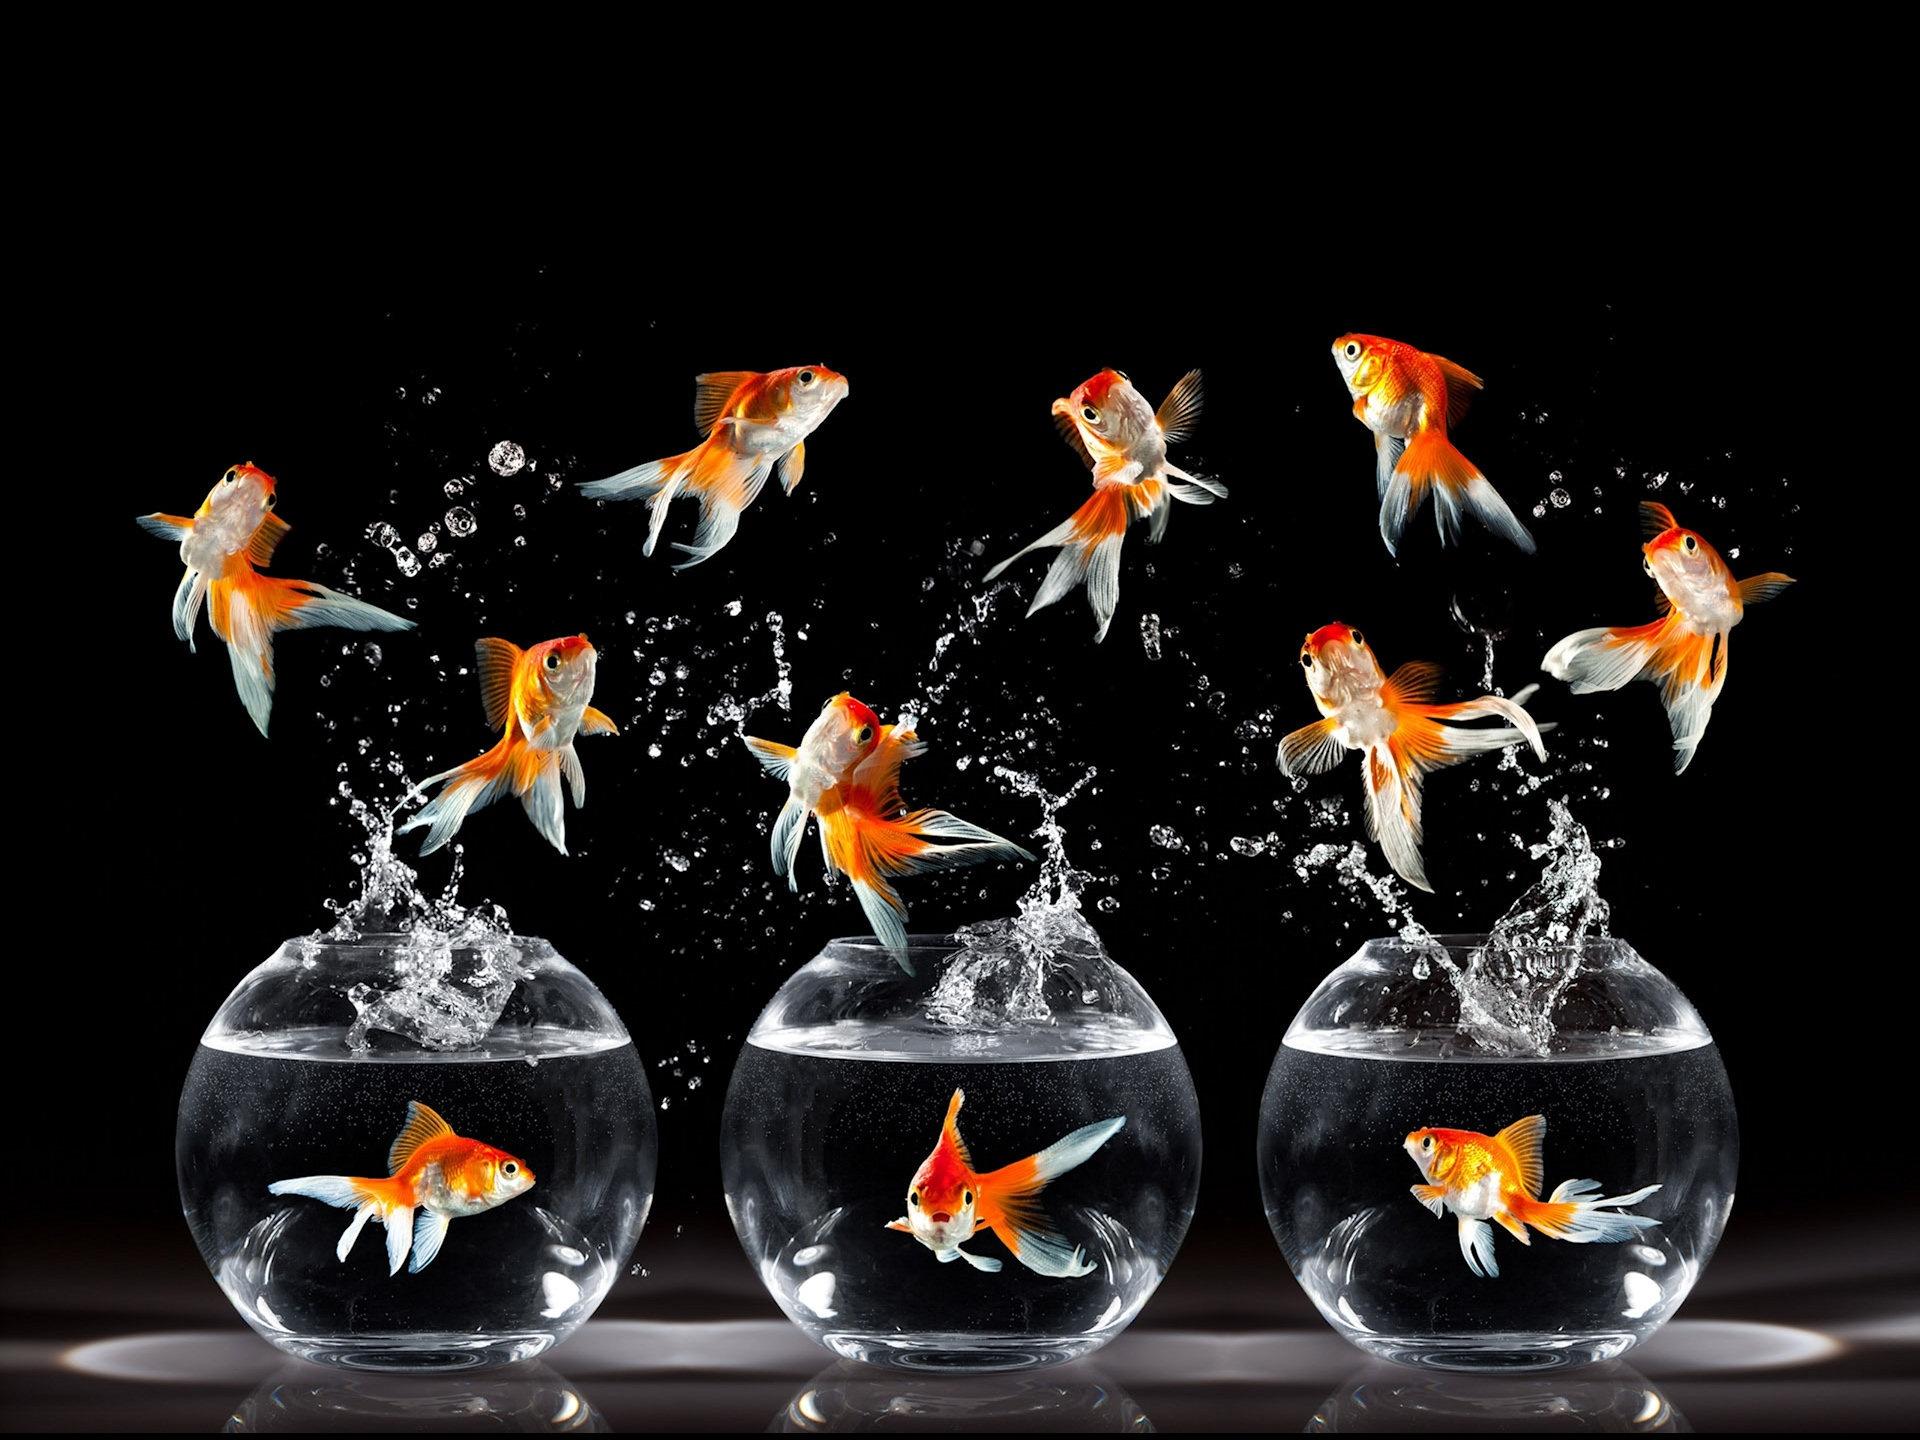 Cirque du Soleil Goldfish Wallpaper   1920x1440 1920x1440